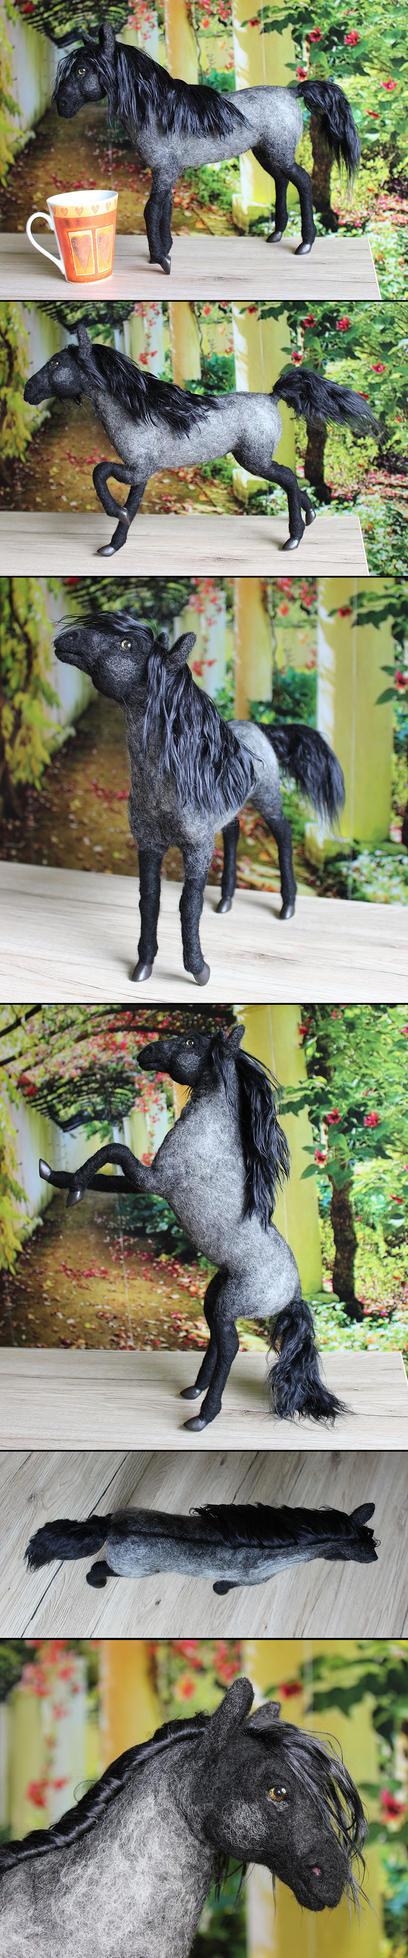 needle felted horse 'Shadif' by Finya-Vardeen